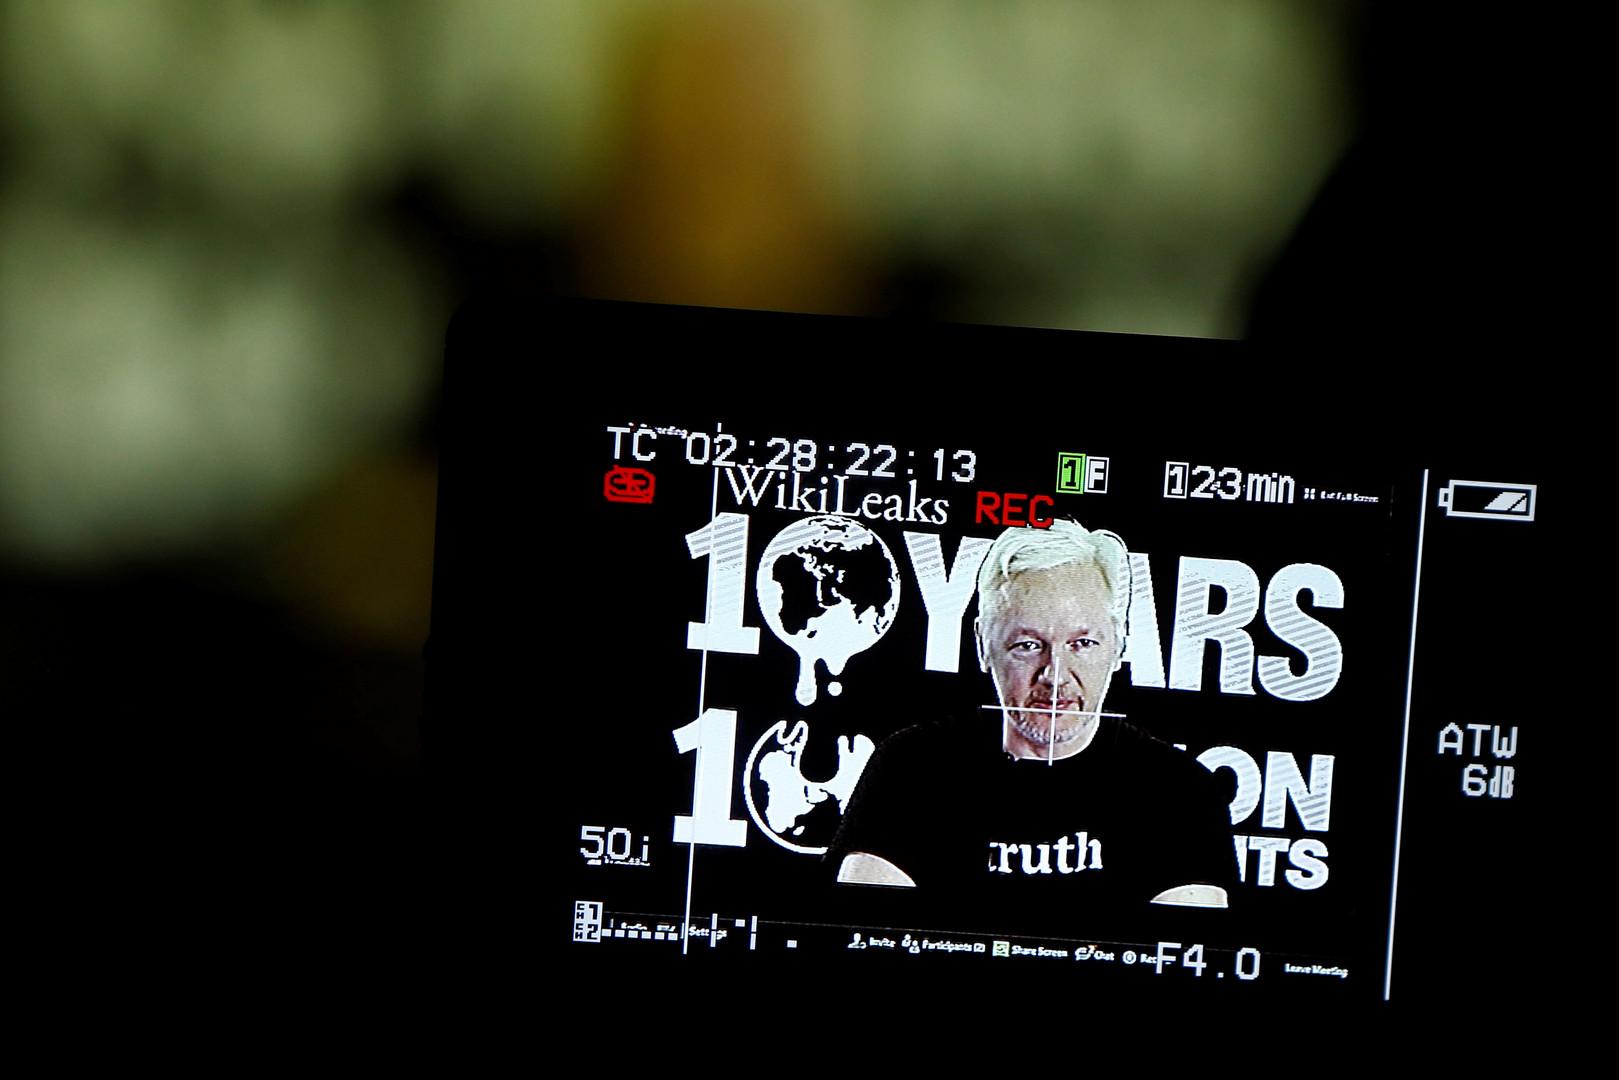 10 лет побед: на юбилее WikiLeaks Ассанж анонсировал публикацию данных по выборам в США